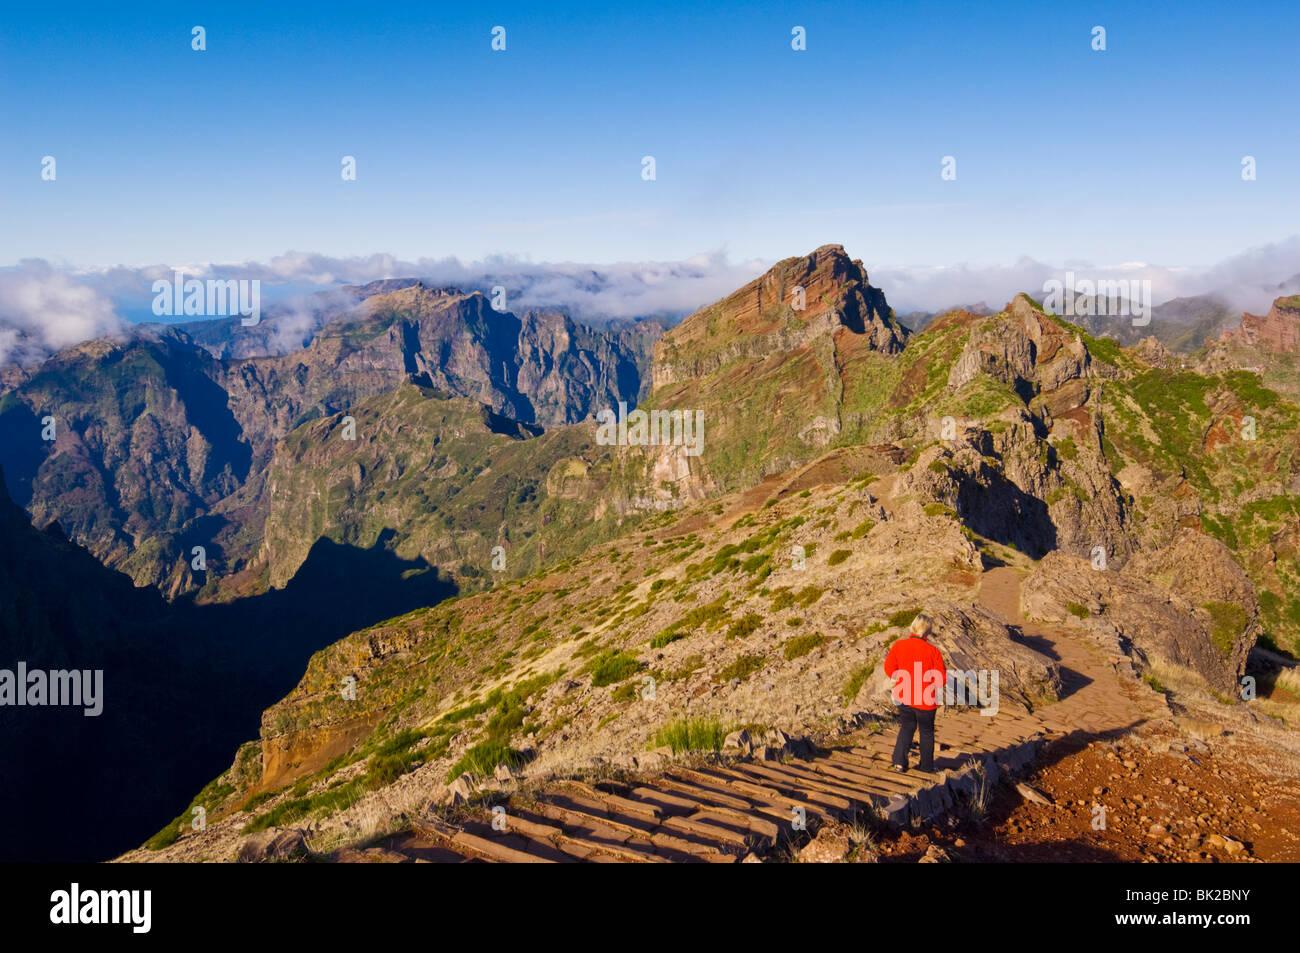 tourist walking through the Volcanic landscape of the Pico do Ariero, Central Madeira, Portugal, EU, Europe - Stock Image